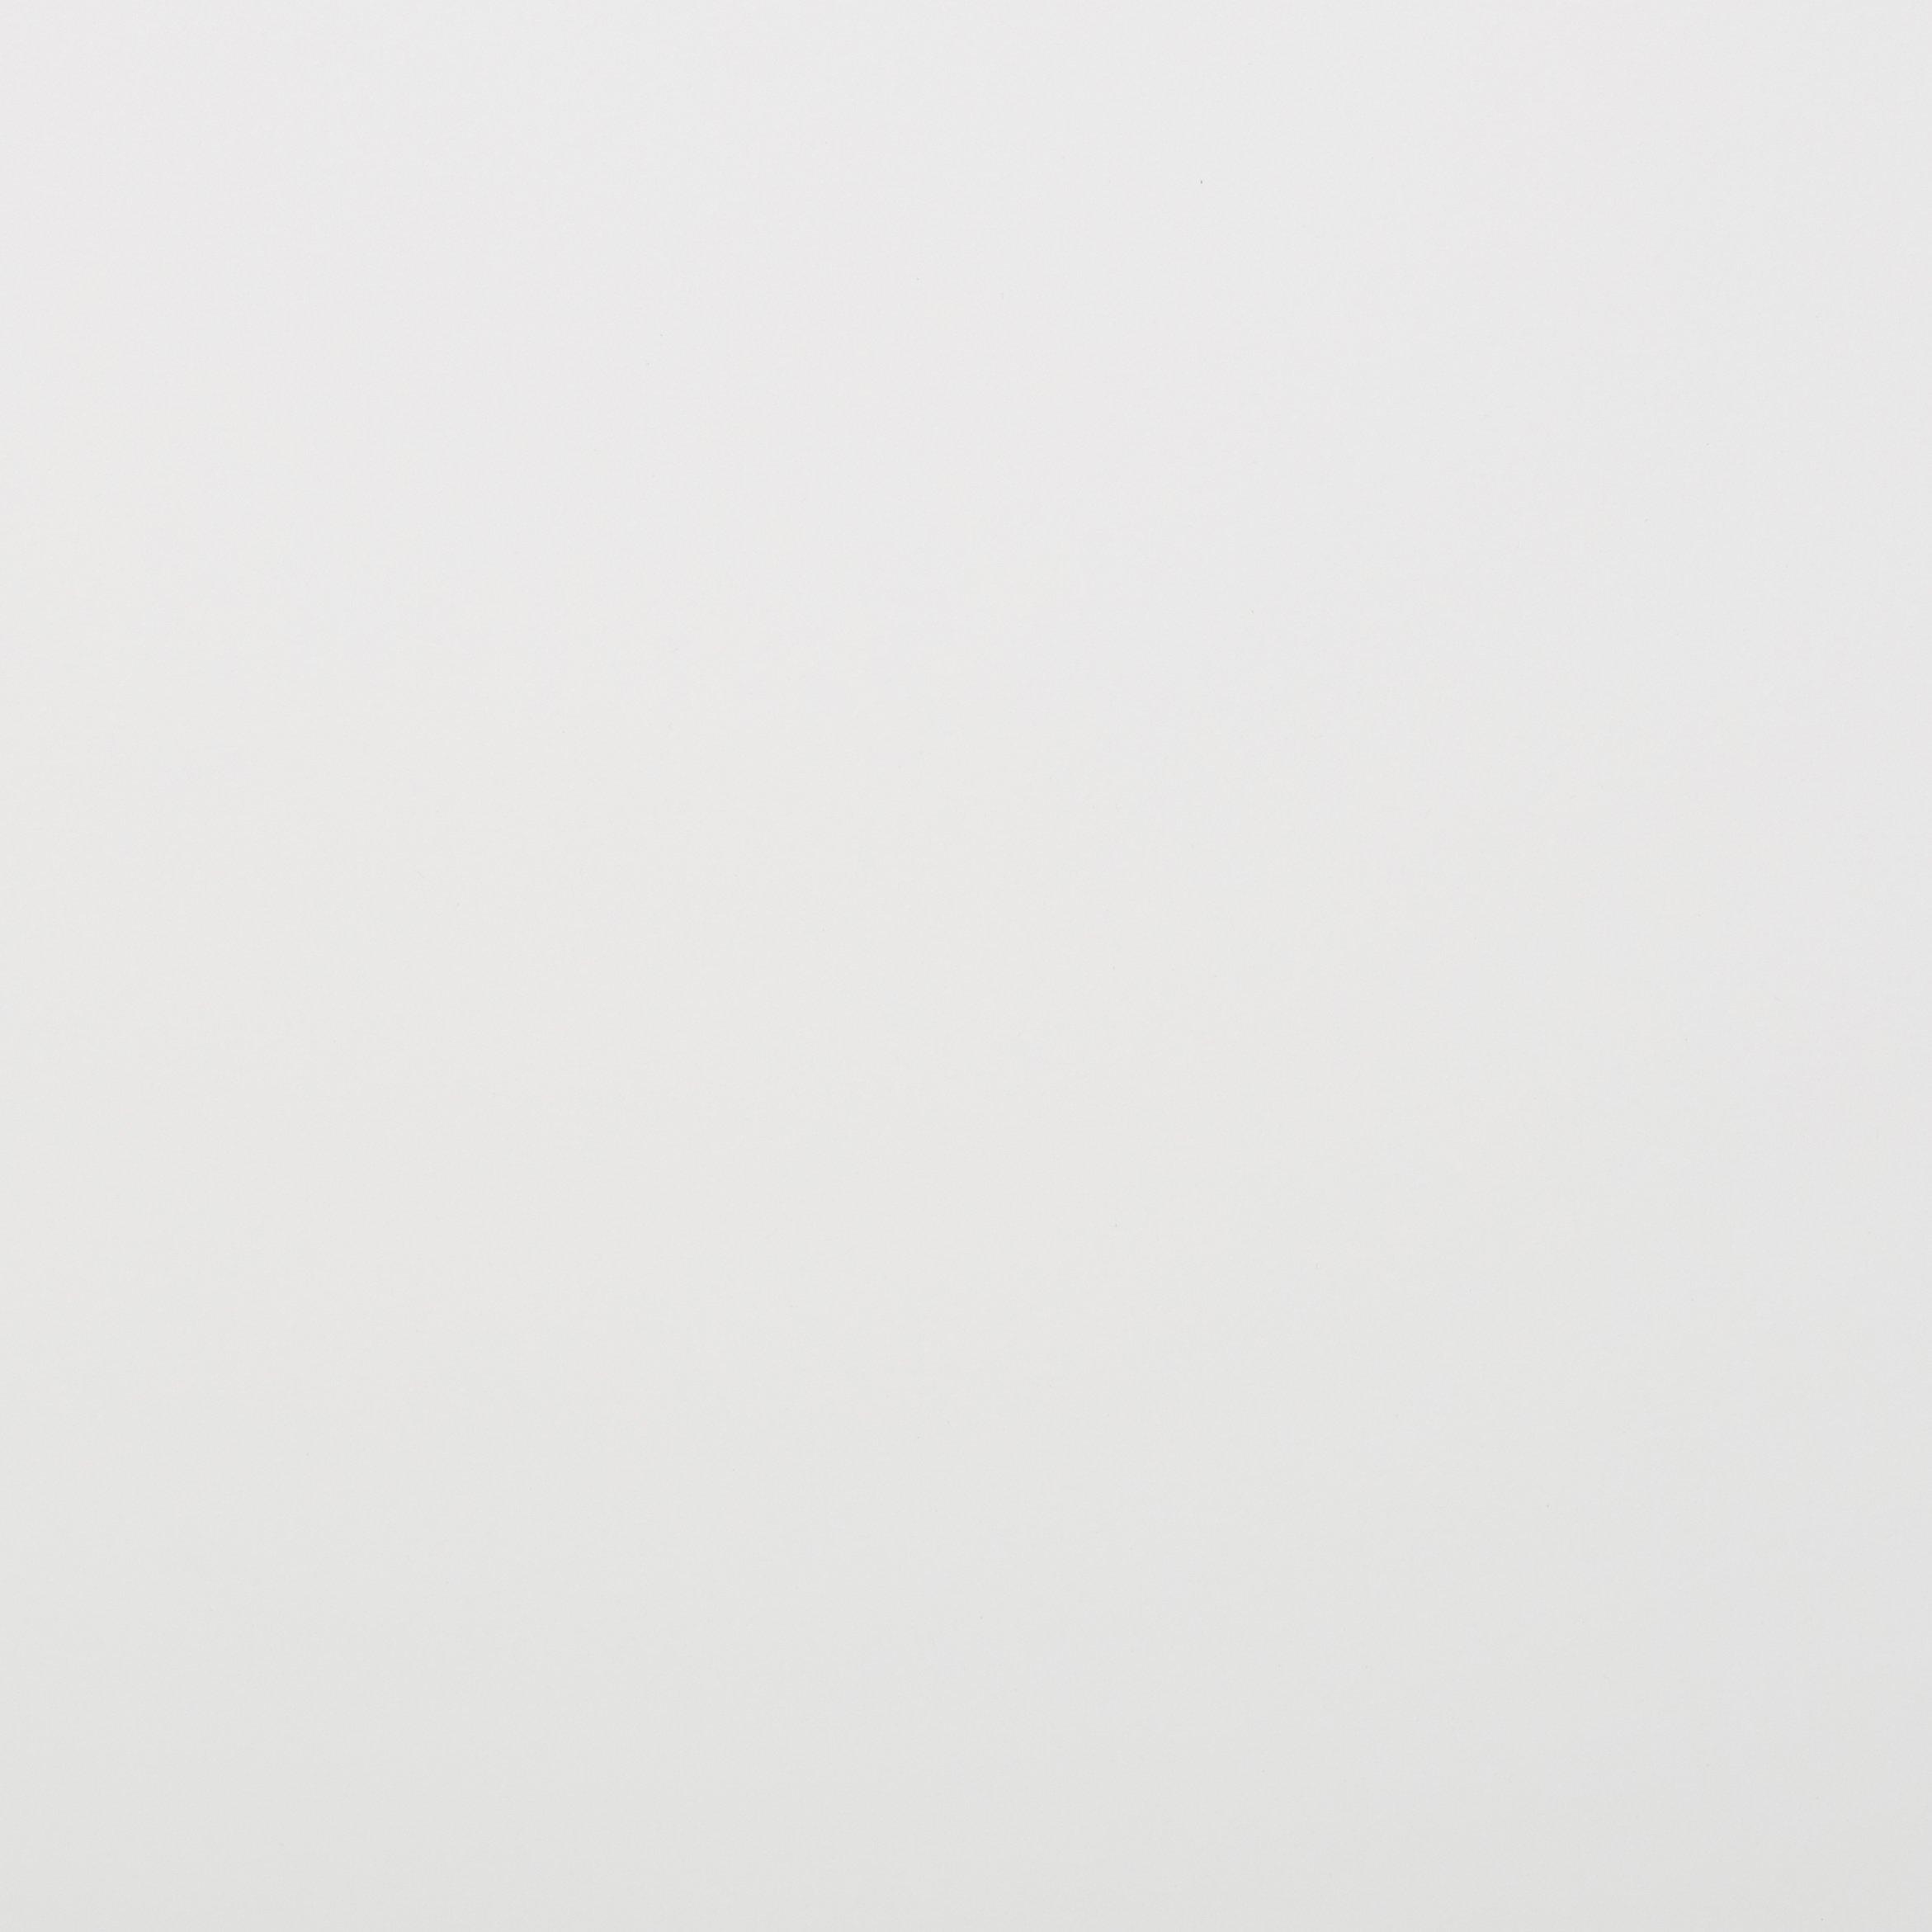 Ashley Furniture Signature Design - Zayley Chest of Drawers - 5 Drawers - Interchangable Panels - Contemporary - White by Signature Design by Ashley (Image #7)